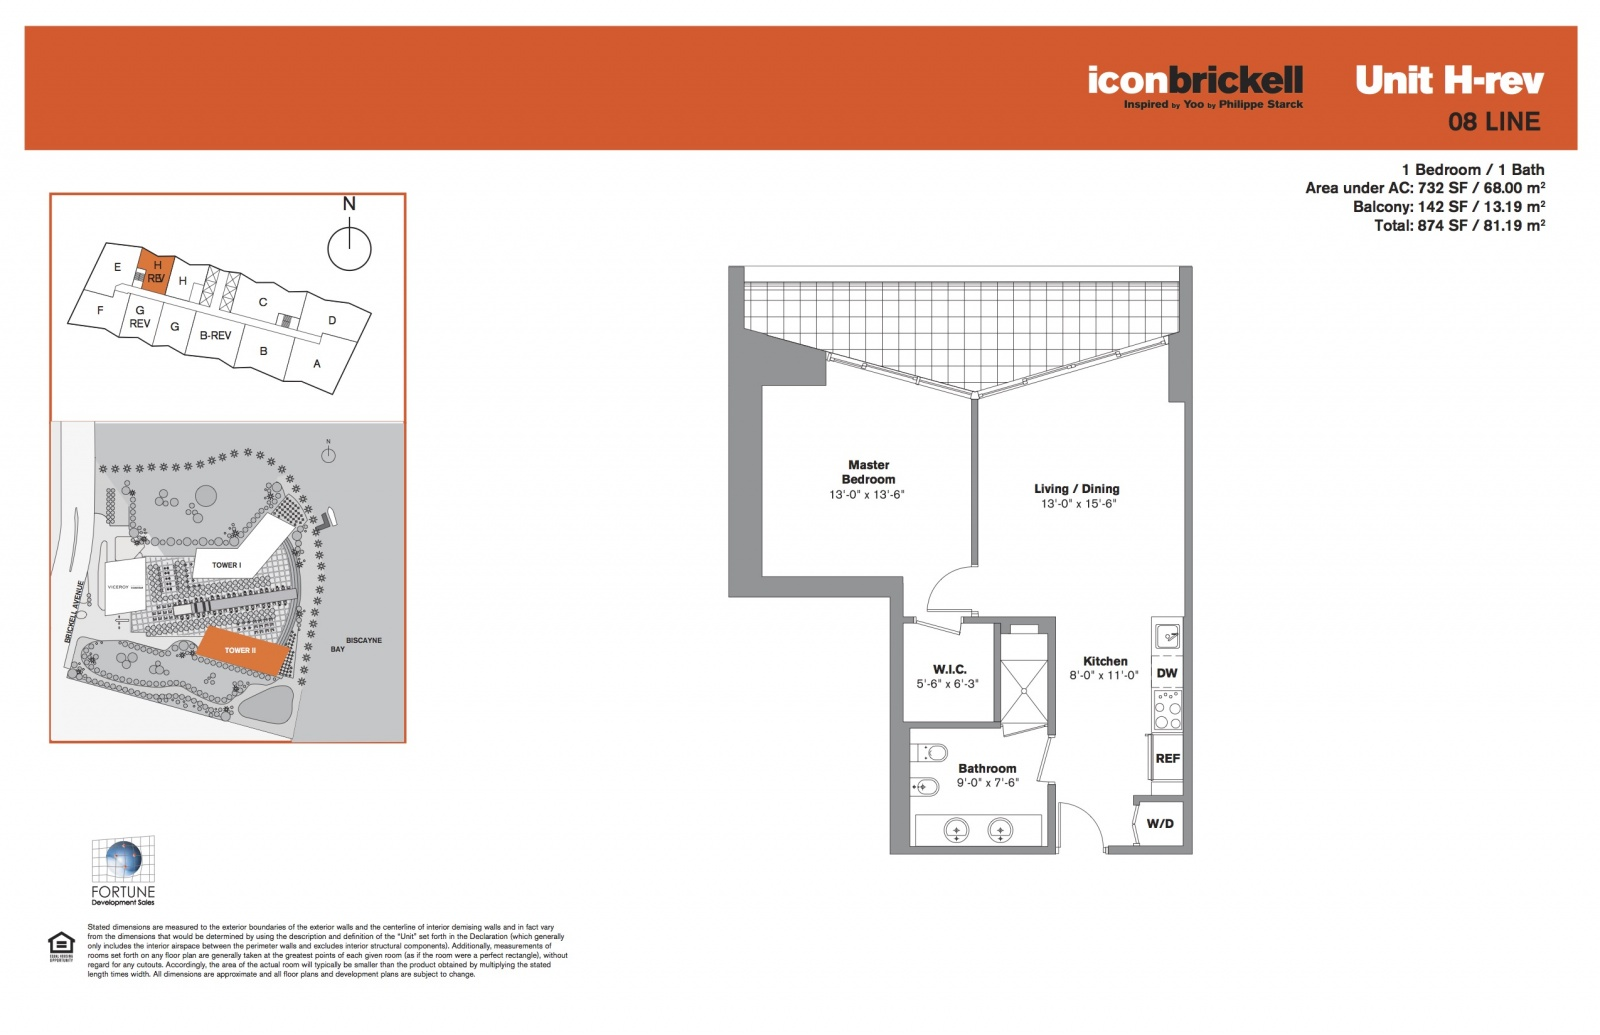 Icon Brickell Two, line 08 floor plan